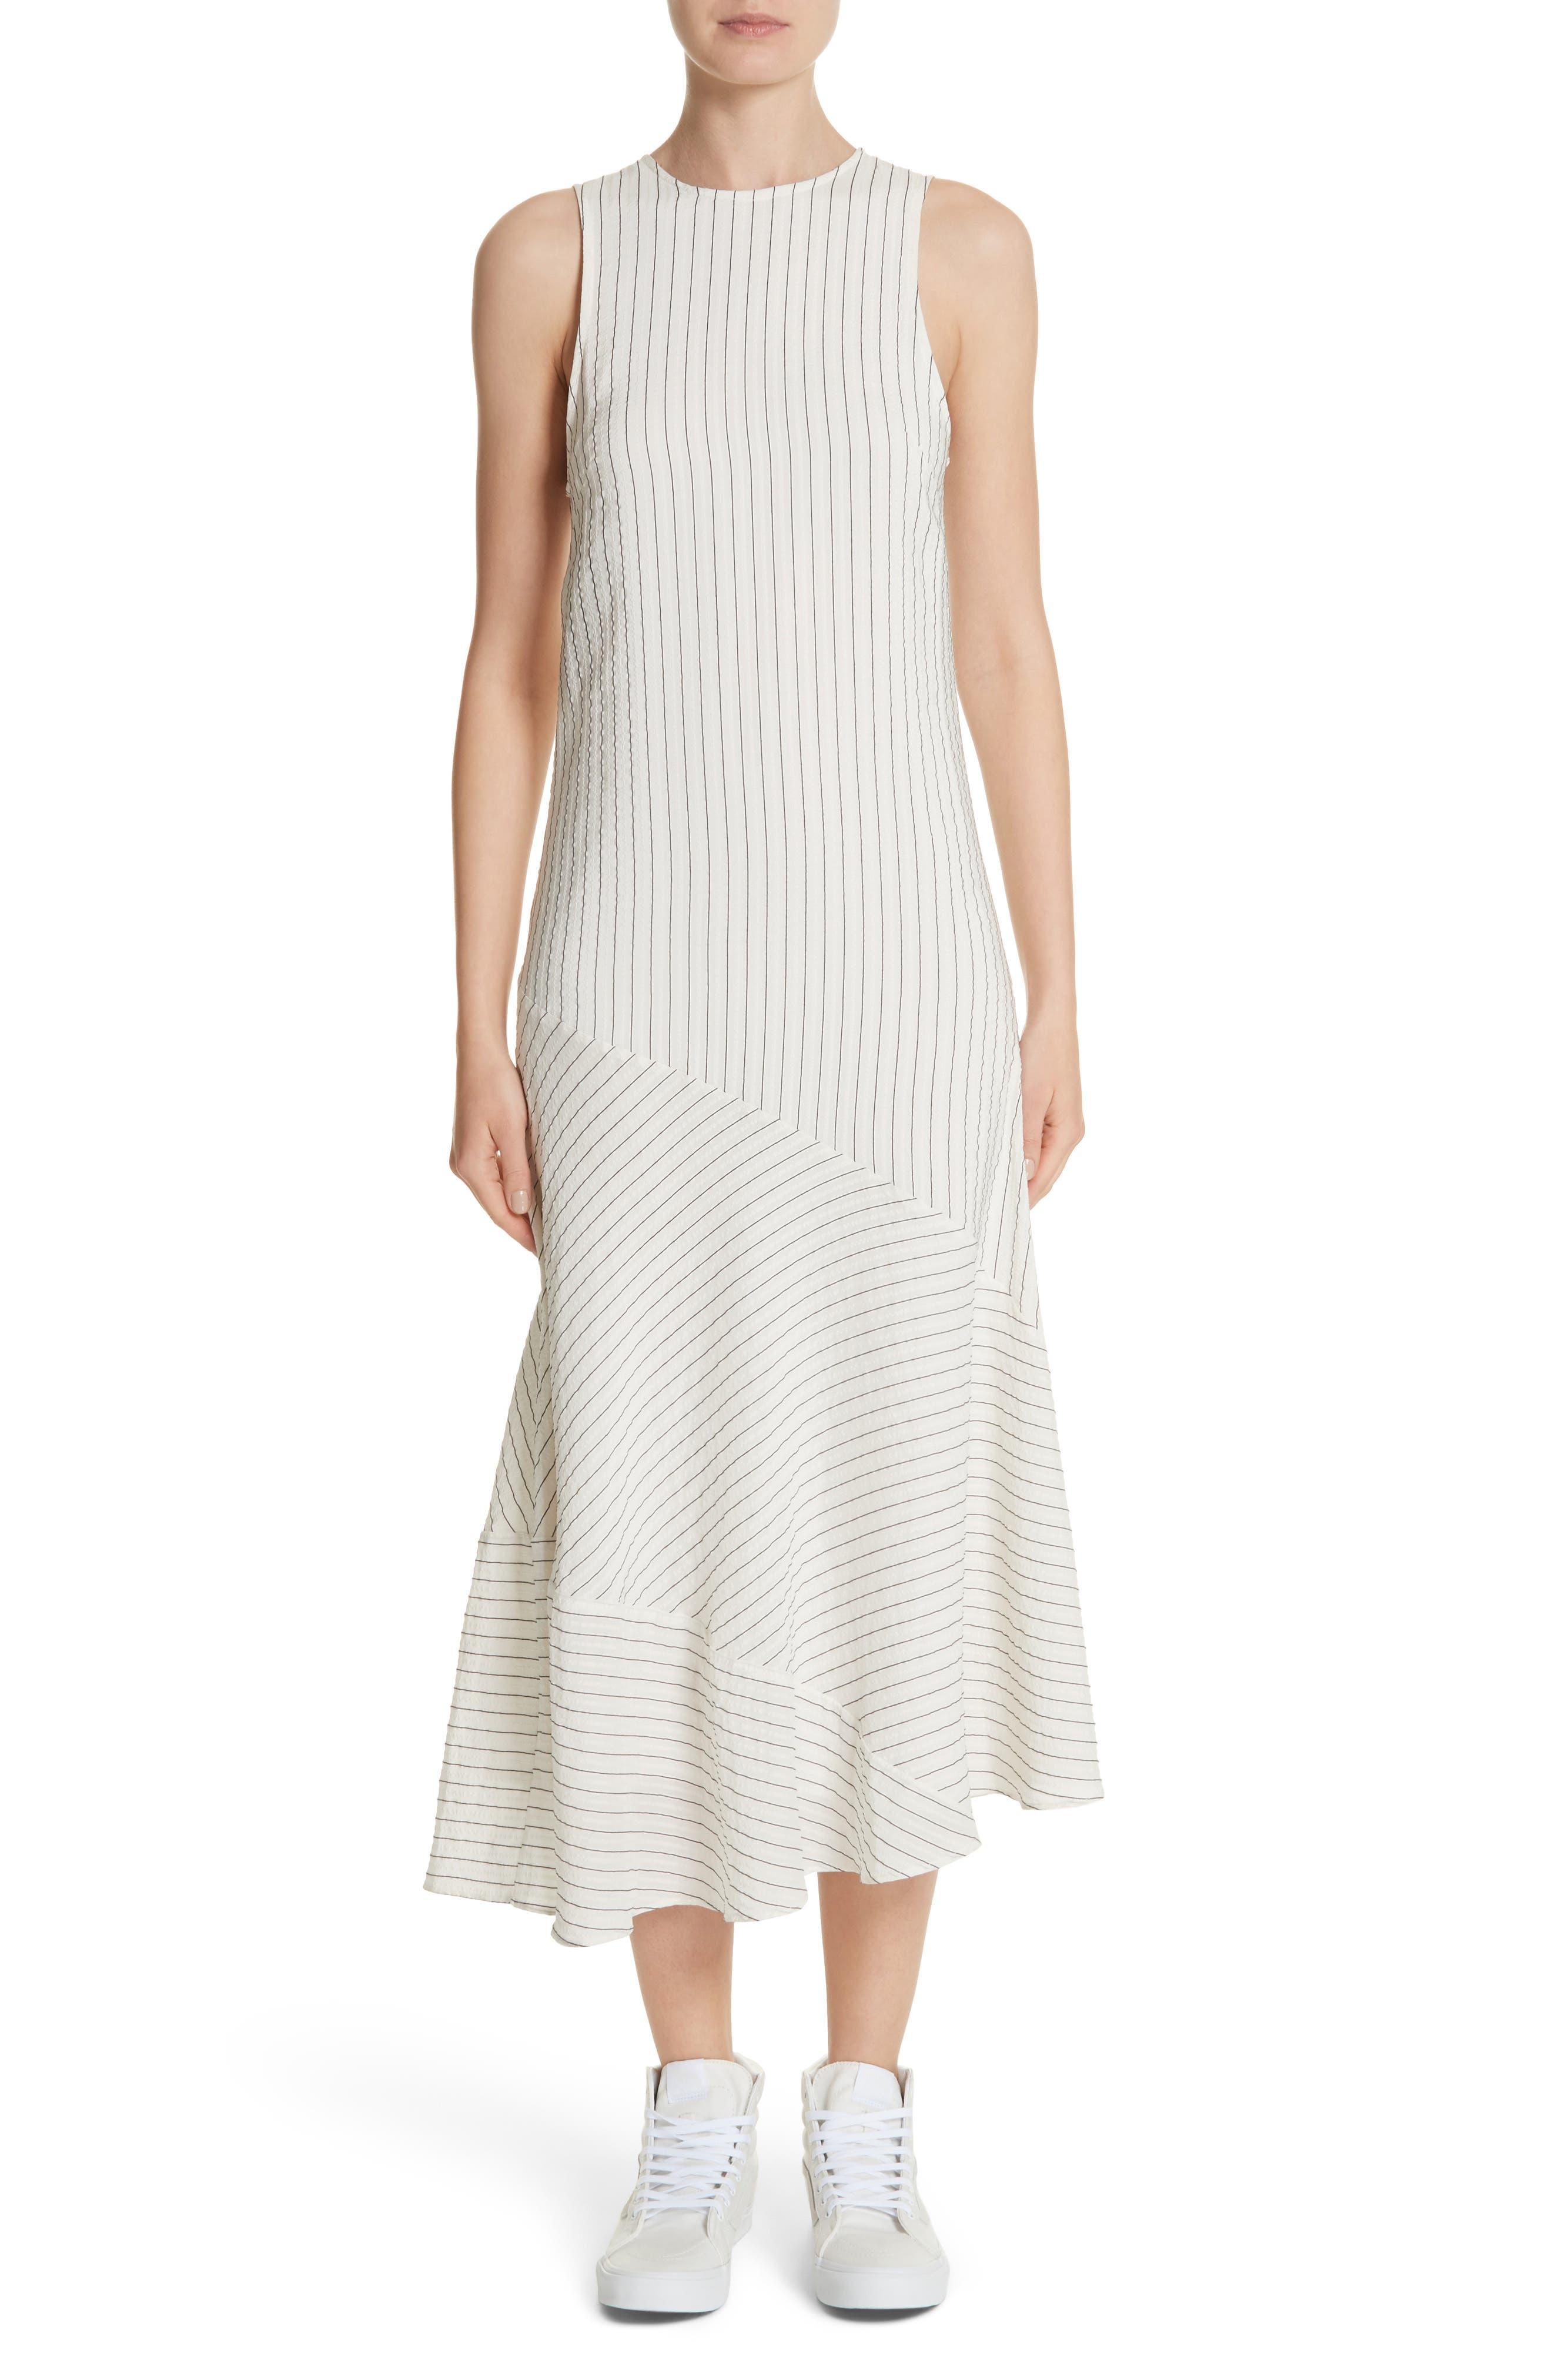 GANNI Wilkie Seersucker Striped Sheath Dress